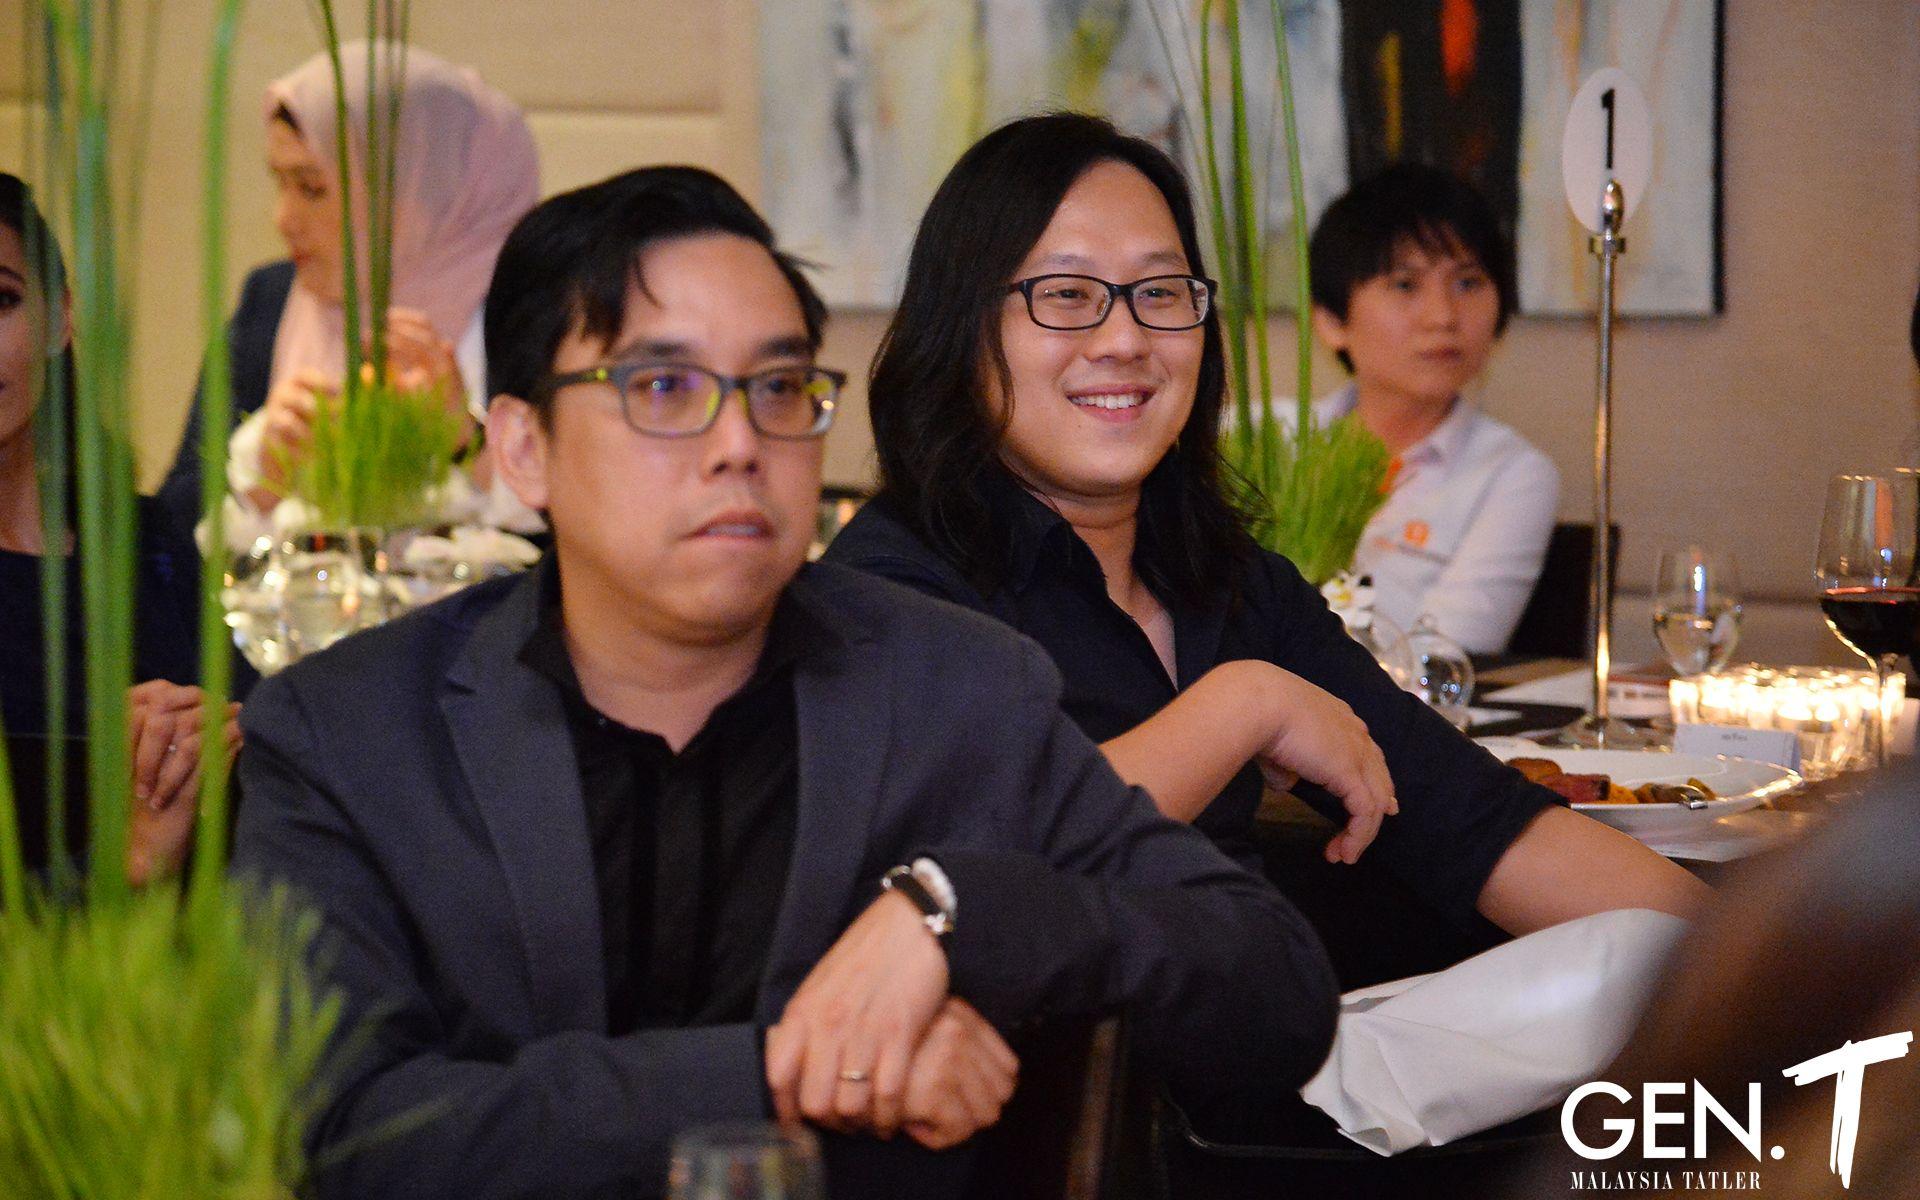 Amer Siddiq Amer Nordin and Ian Yee